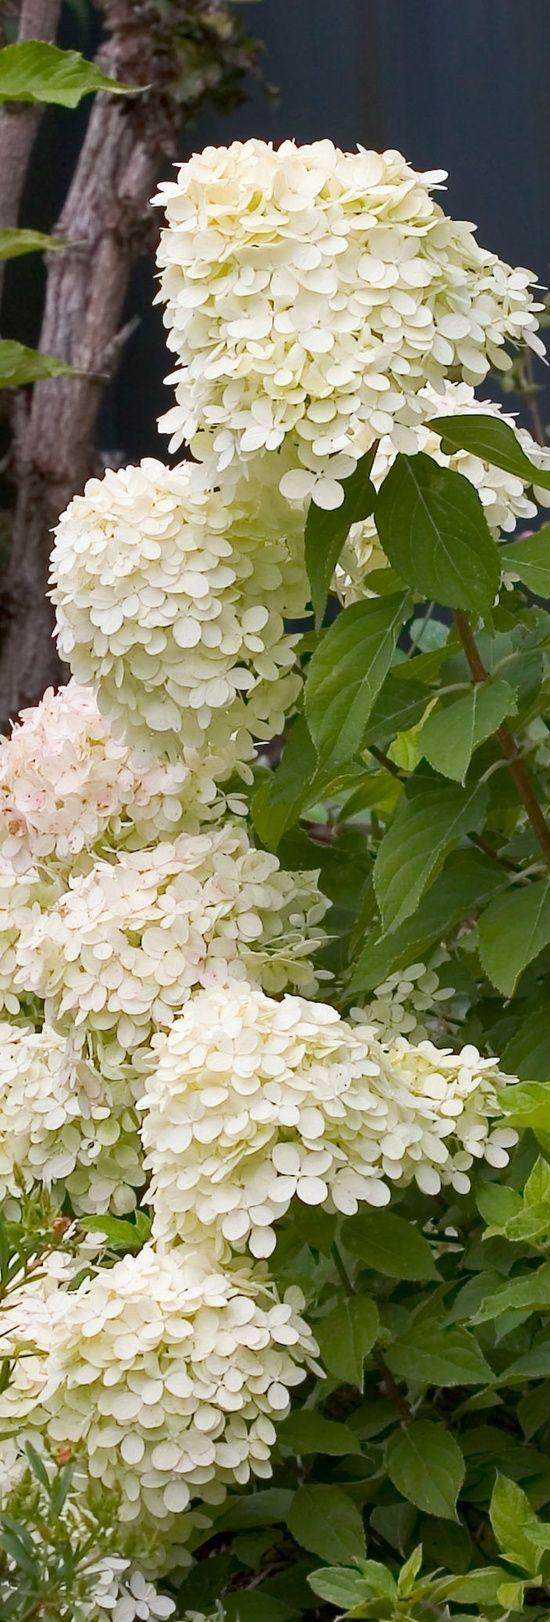 Hydrangeas (probably Hydrangea paniculata 'Limelight')